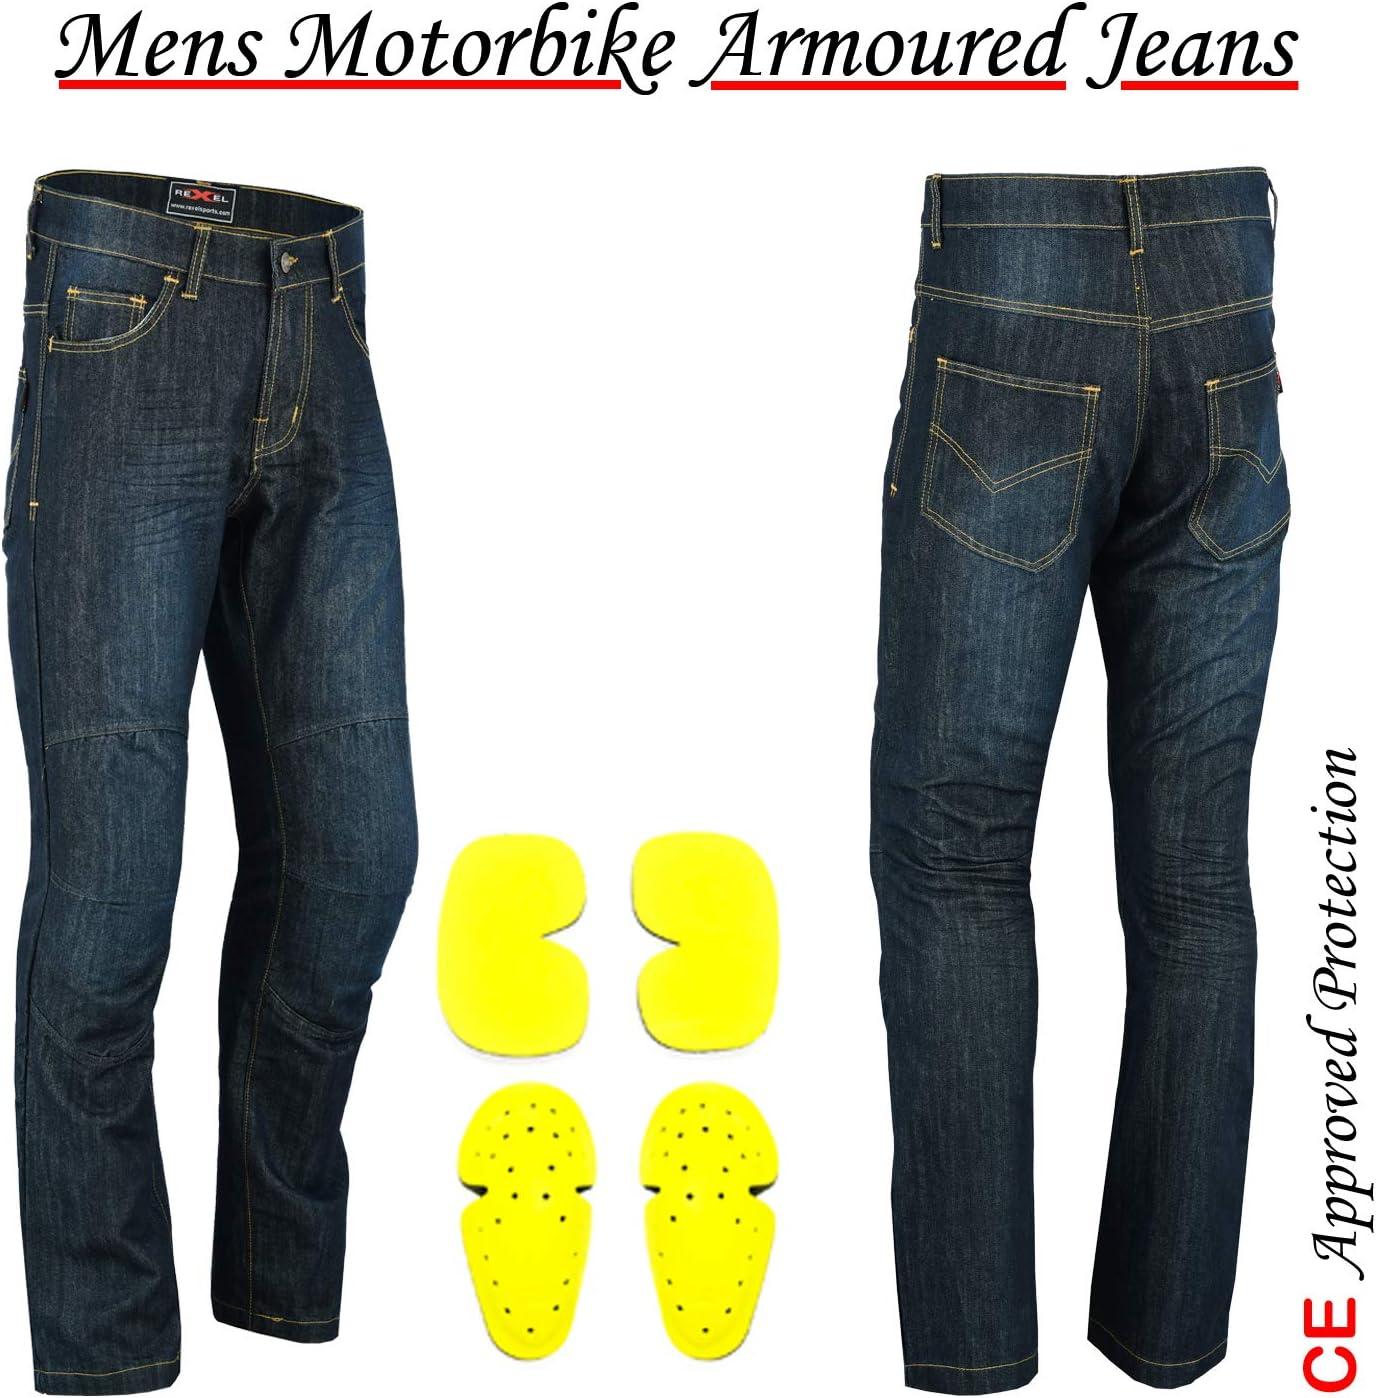 VASTER M/änner Motorrad Jeans Motorrad Schutzhose verst/ärkte Jeans Hose gef/üttert Schutz CE zugelassen HIP /& KNEE abnehmbare gepanzerte Modern-Fit blue Denim 30 L/änge W40 - L30